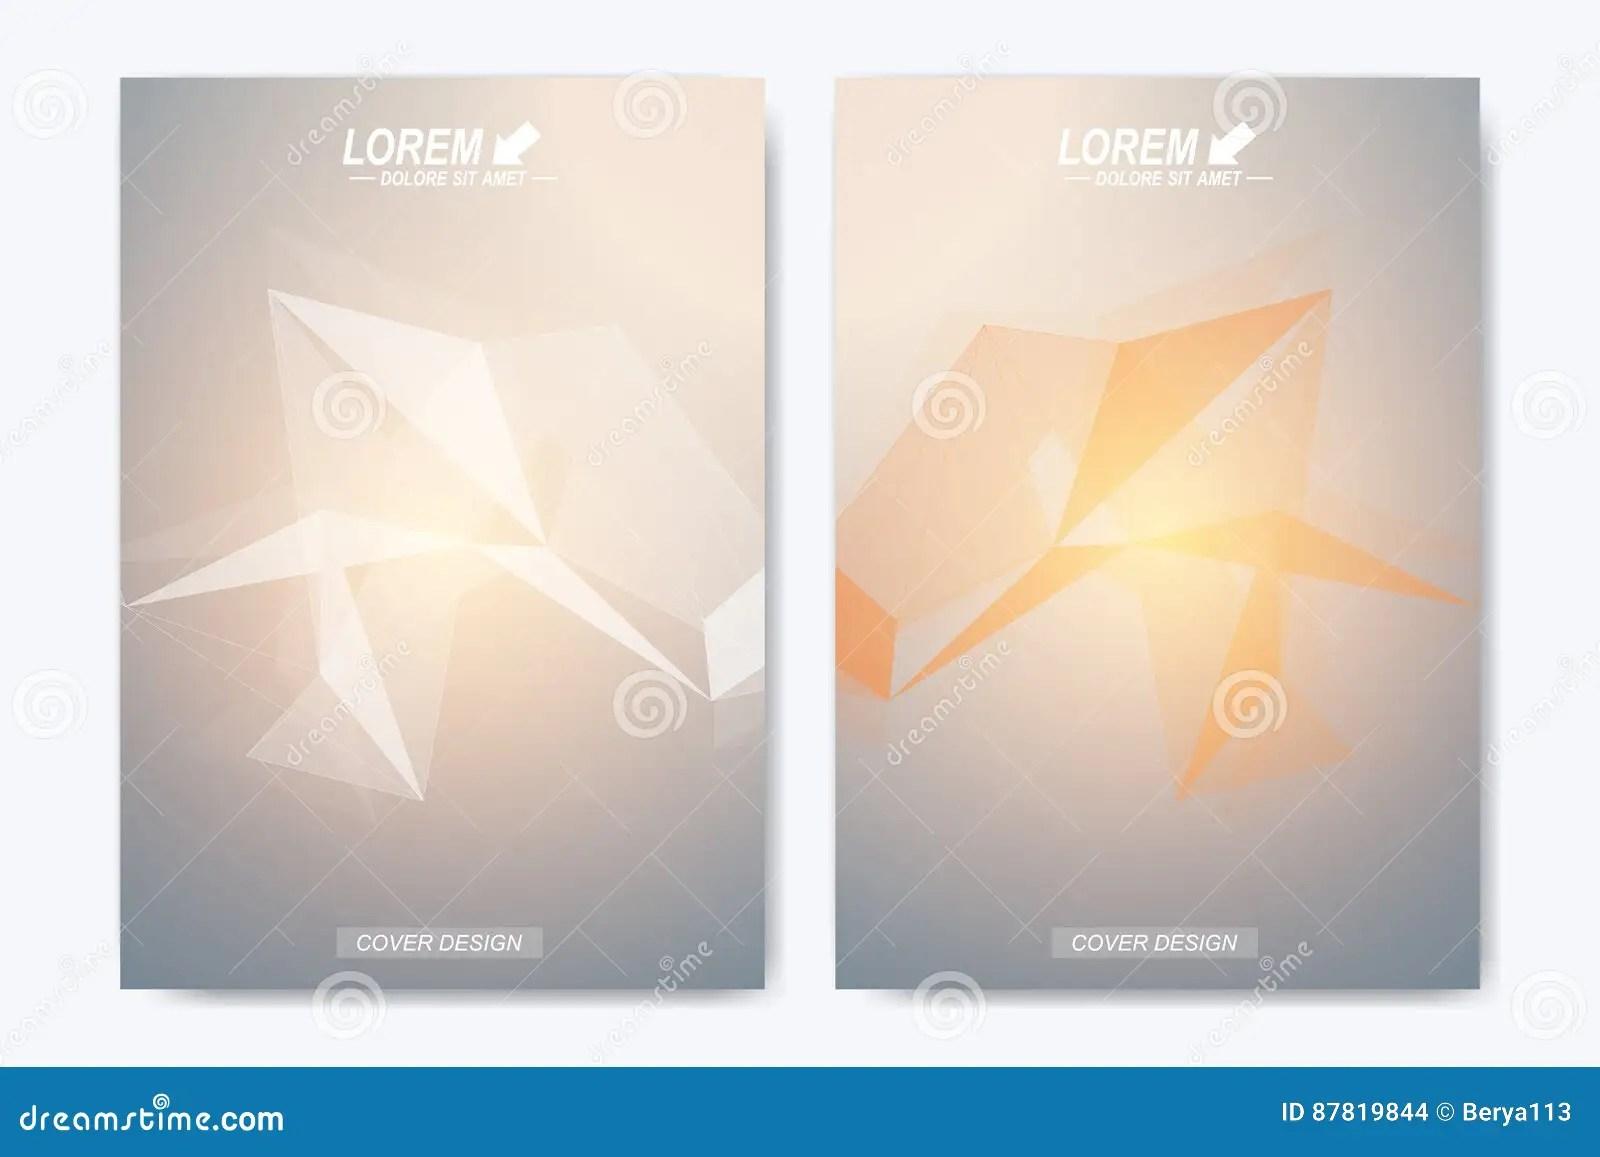 Modern Vector Template For Brochure Leaflet Flyer Advert Cover Catalog Magazine Or Annual